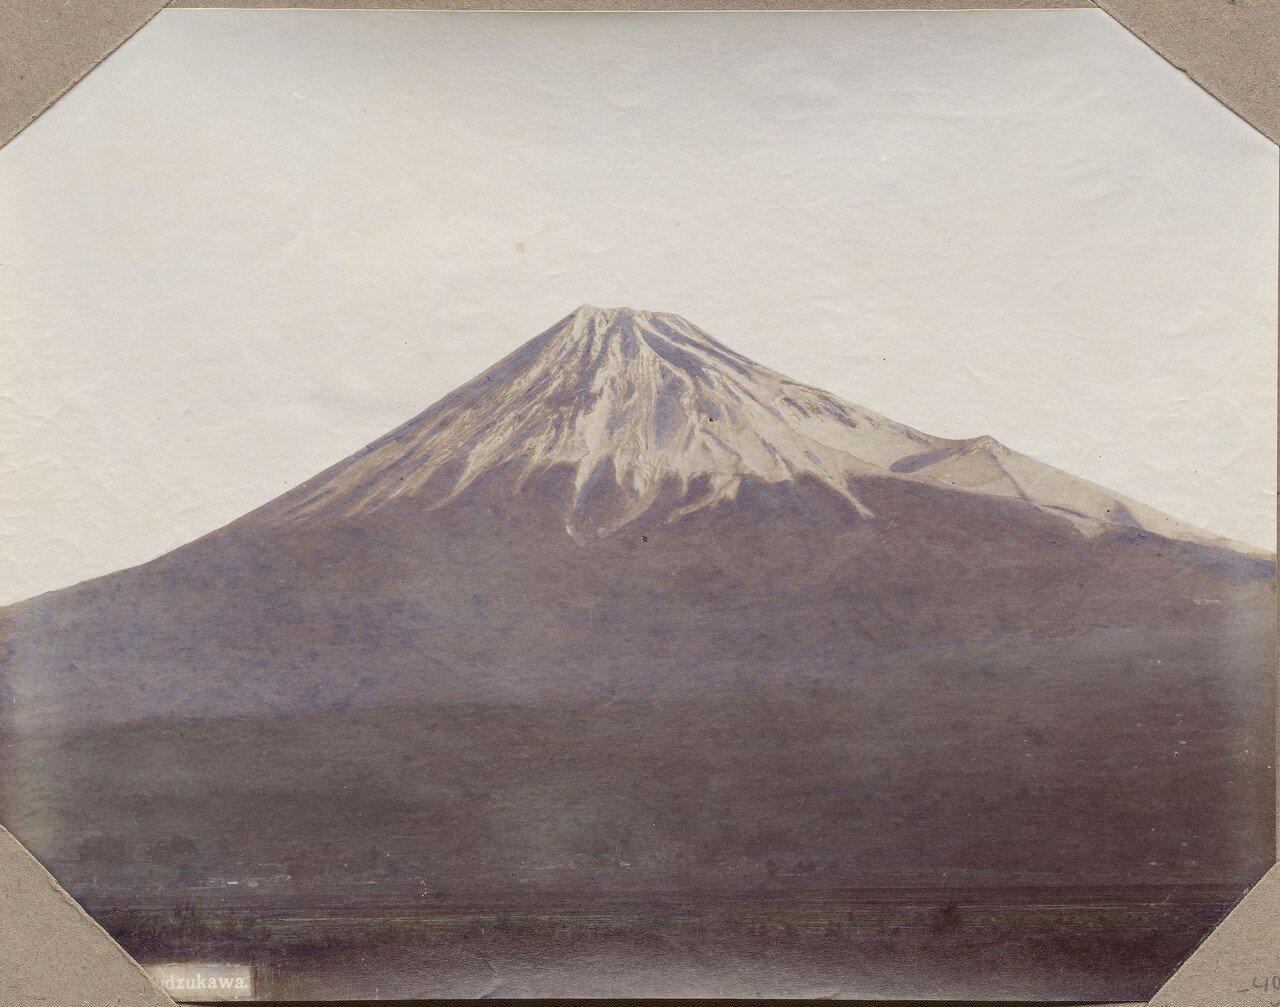 Гора Фудзи из Судзукавы